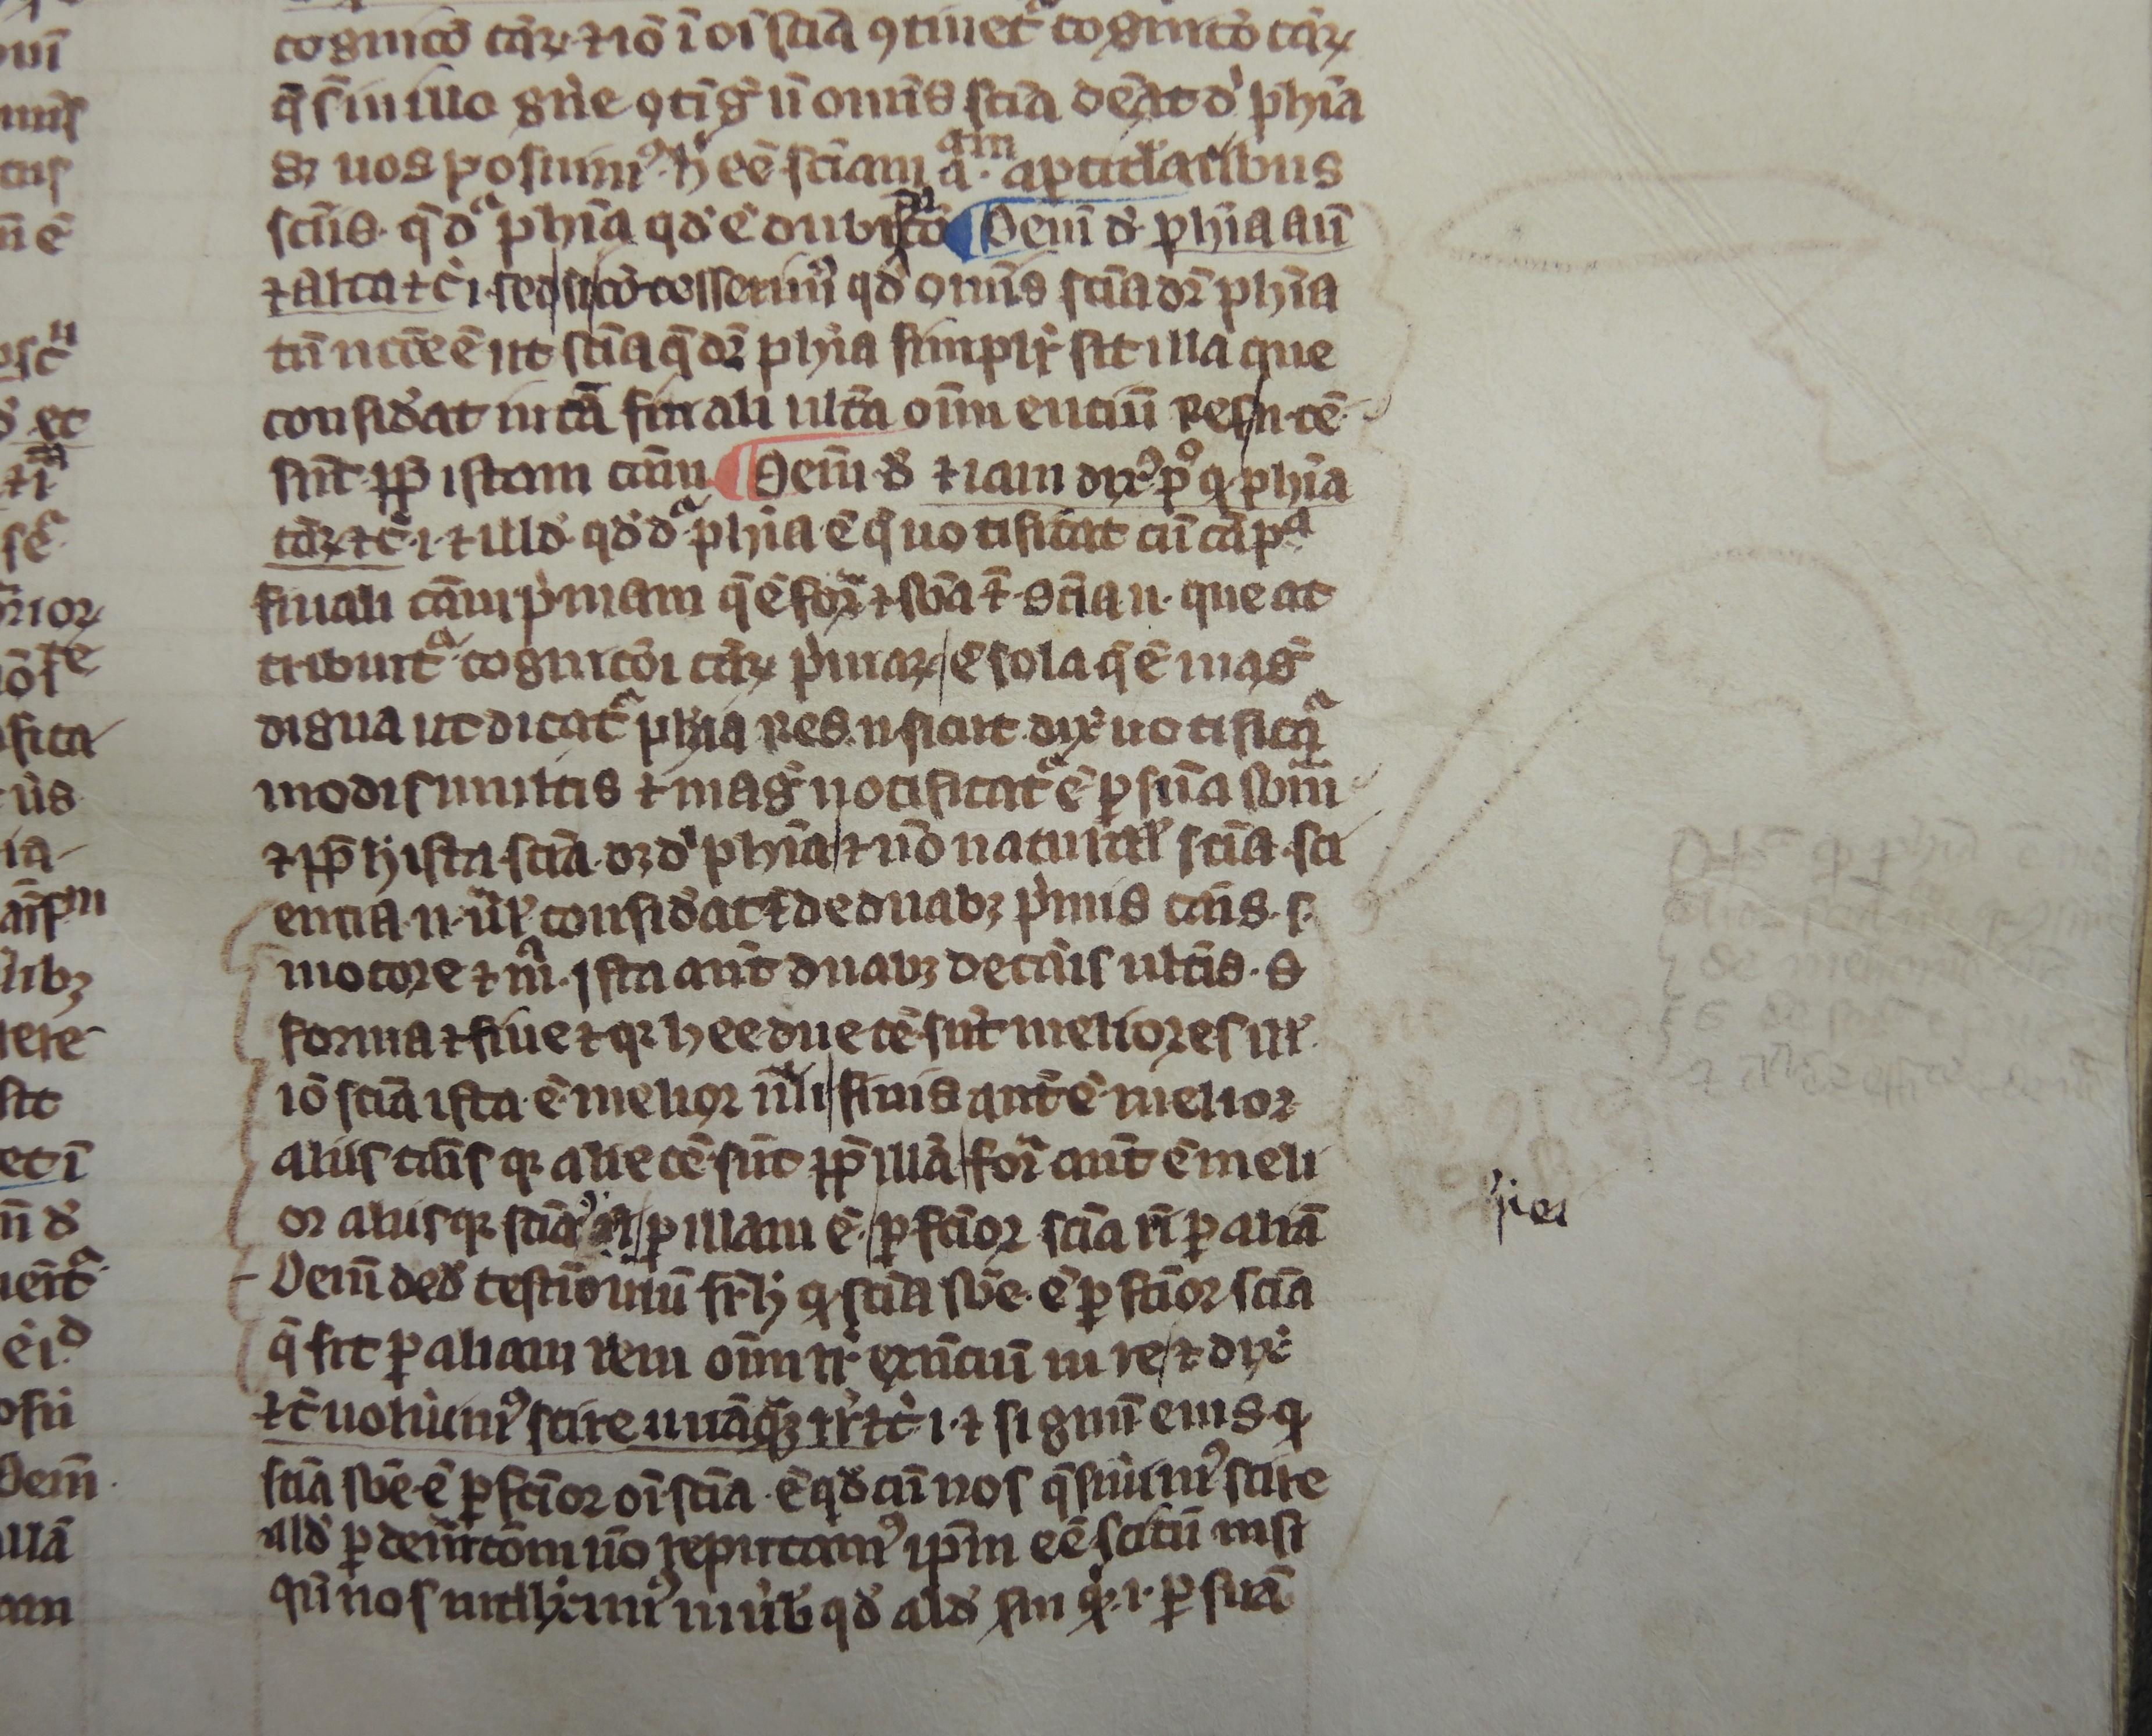 Detail of Averooes Manuscript Ms 112 showing marginalia and doodles